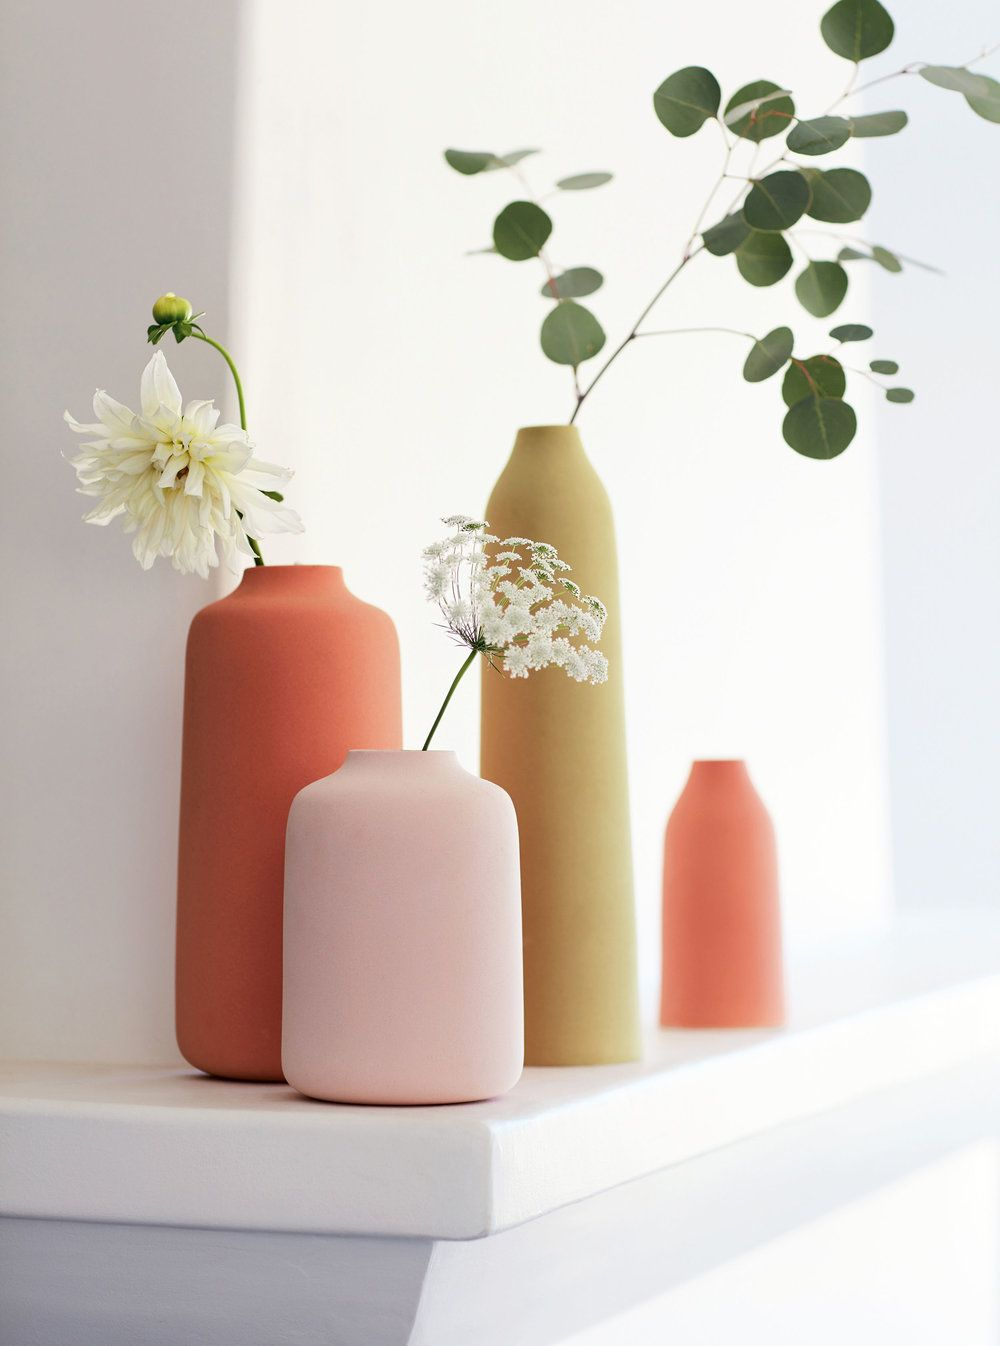 Simply Beautiful Single Stems In Vases Photographer Debi Treloar